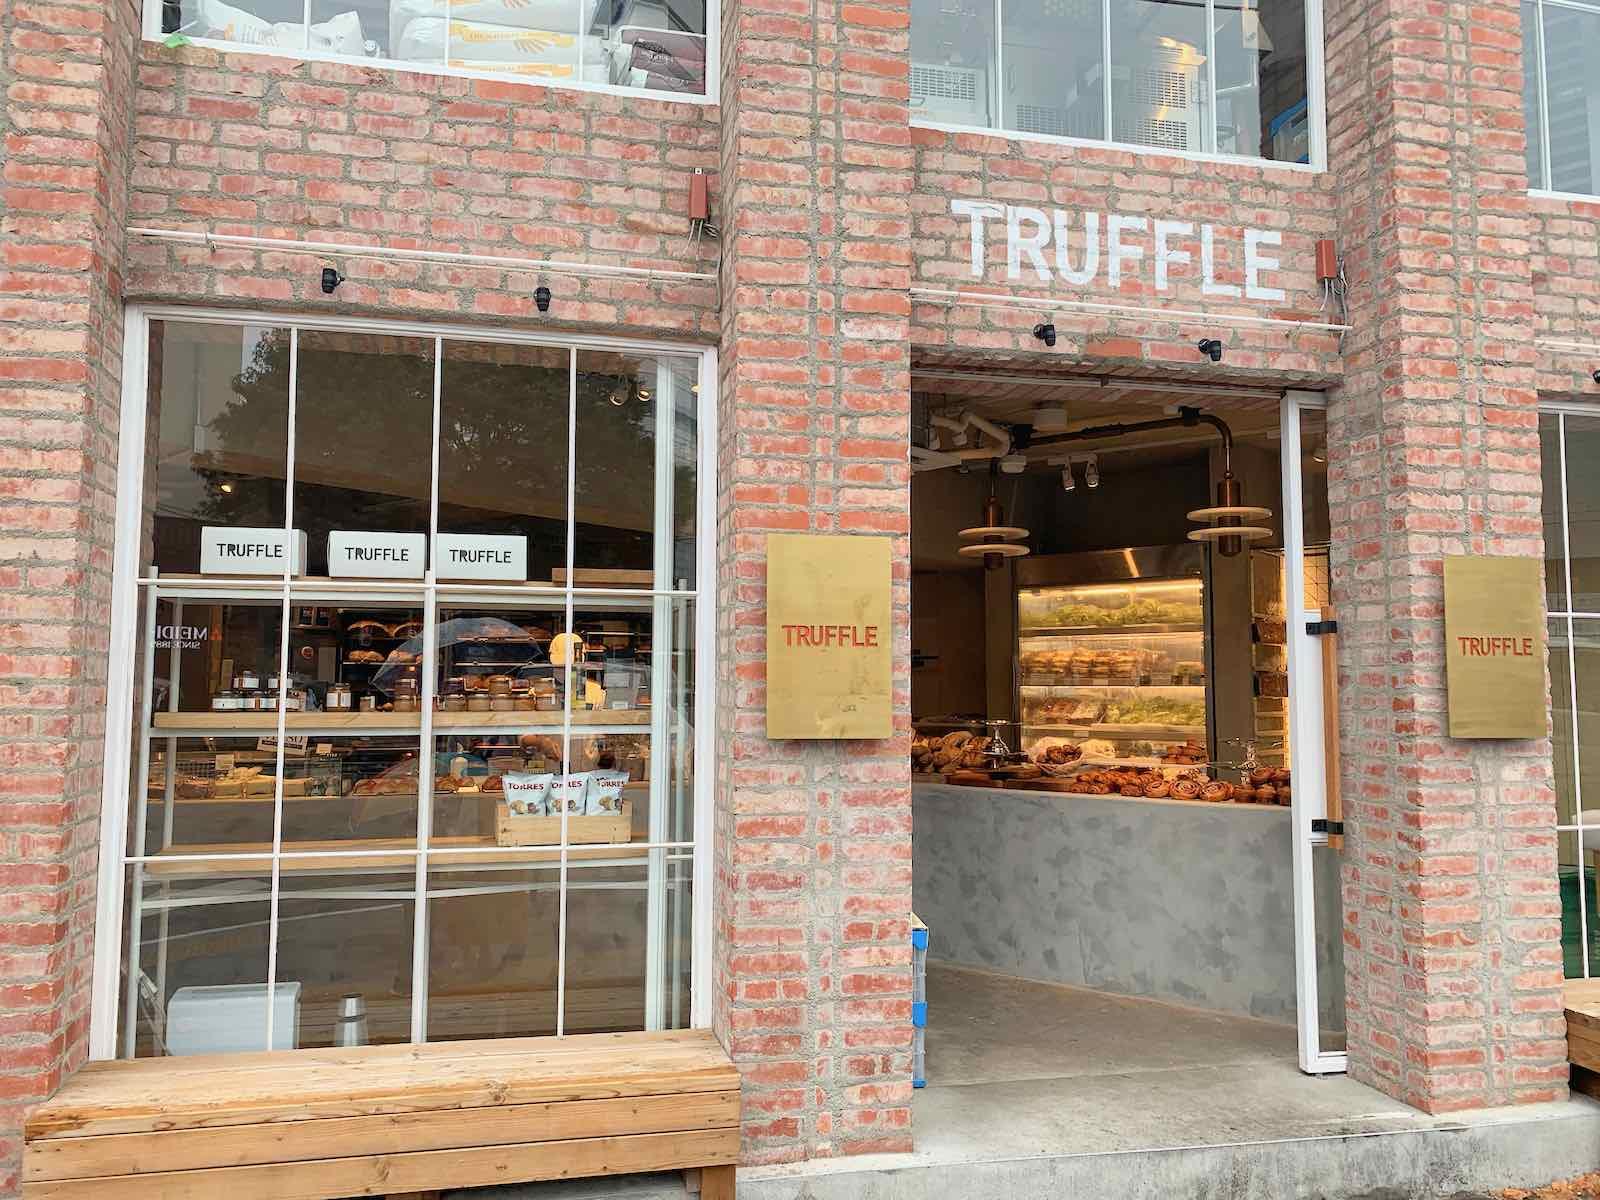 広尾 truffle